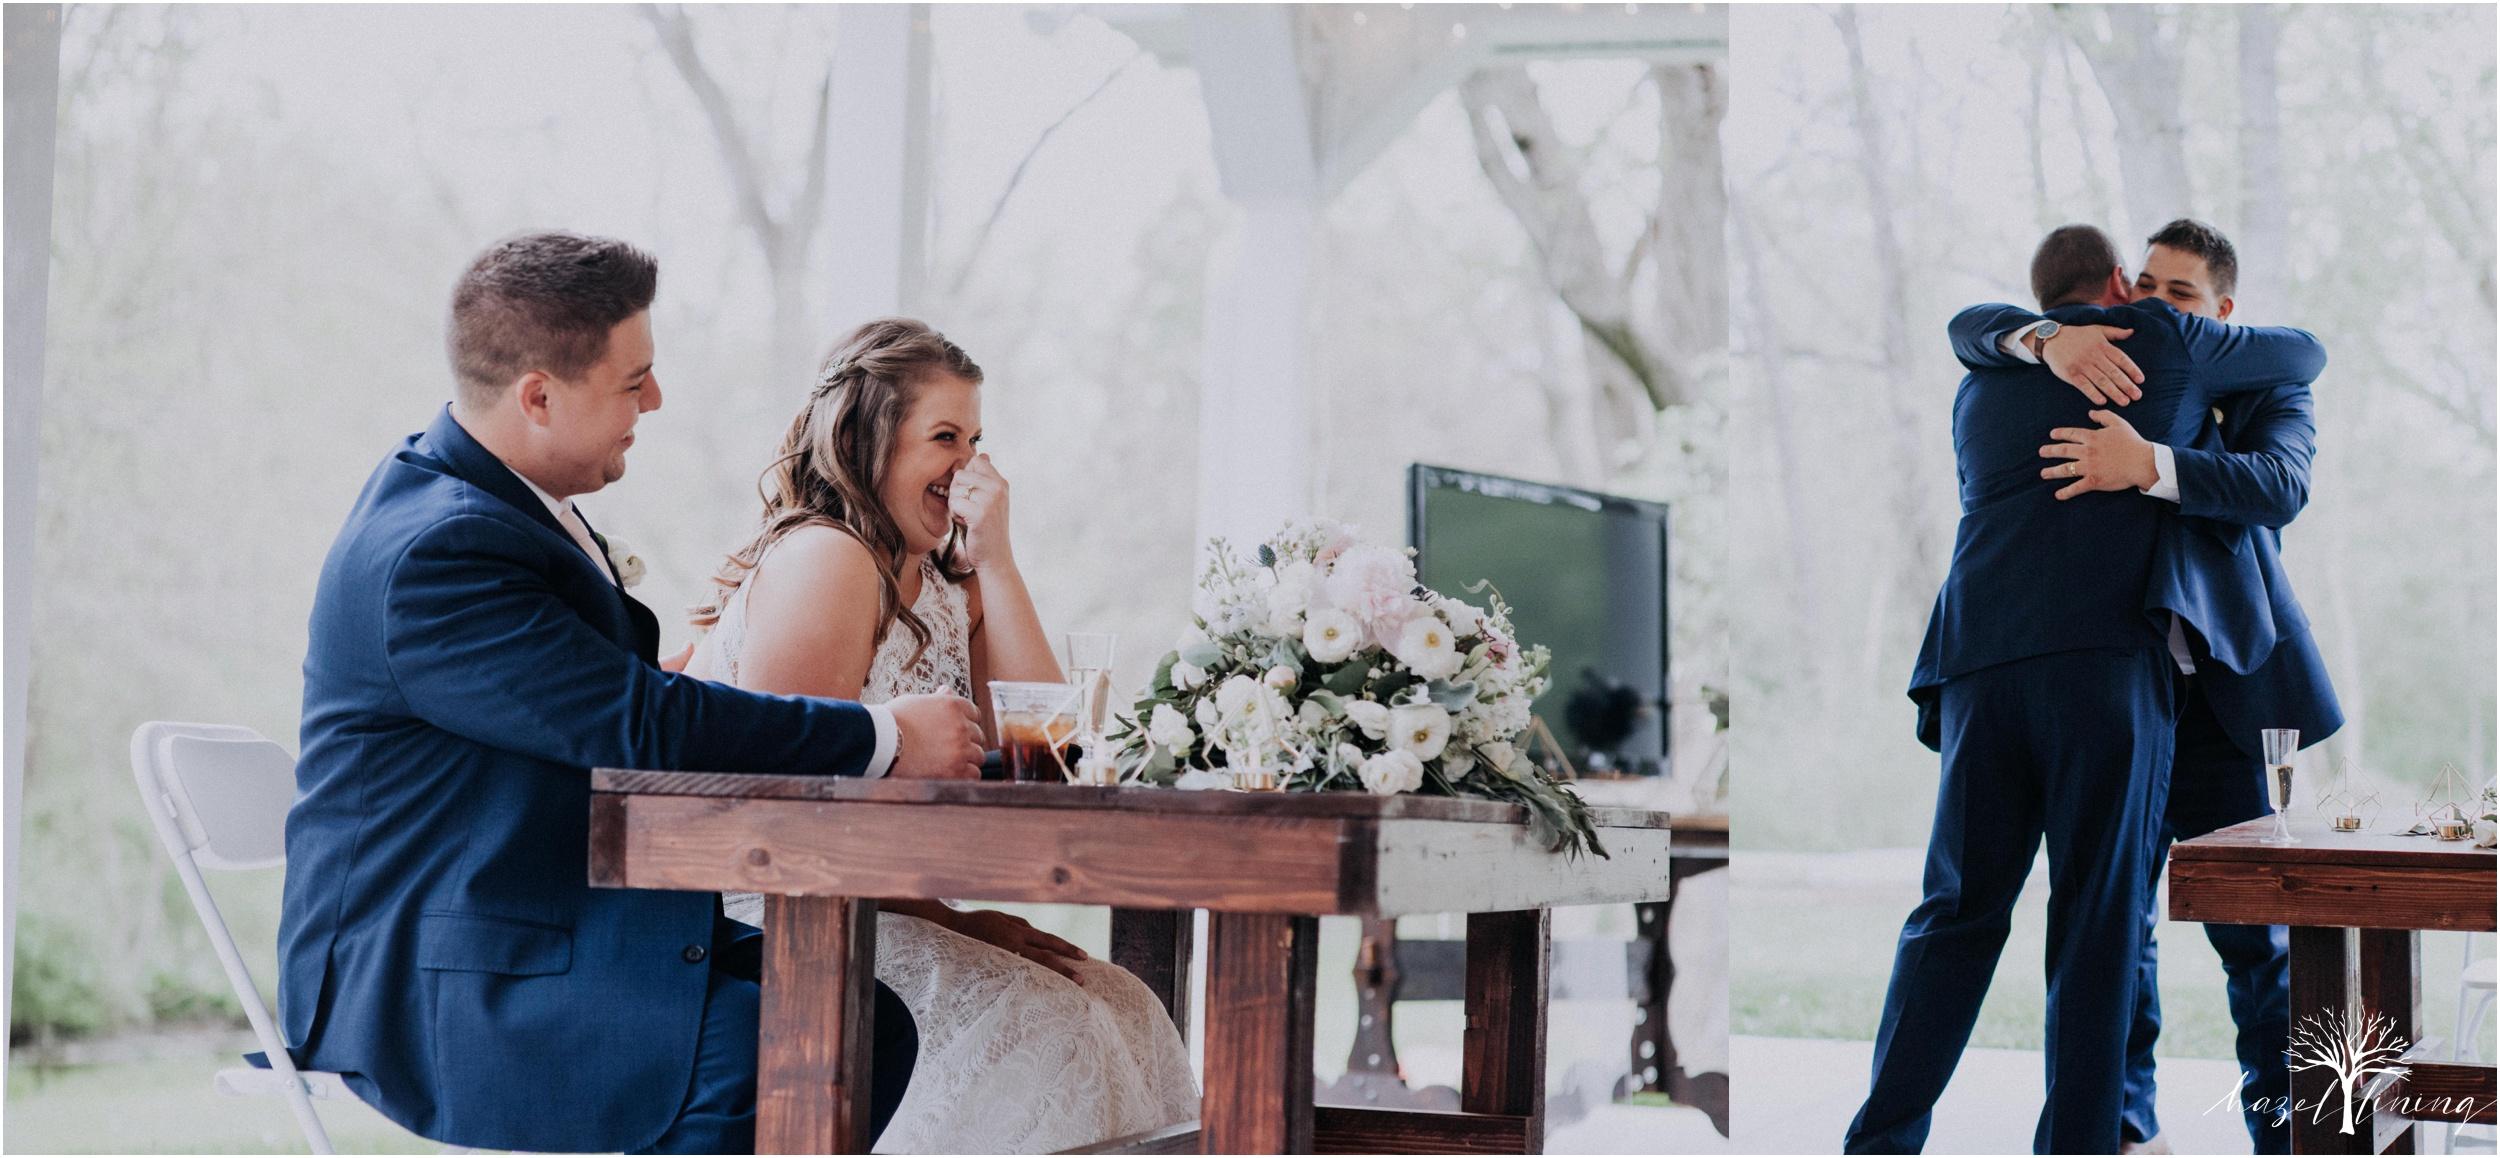 hazel-lining-travel-wedding-elopement-photography-abby-skyler-hunt-the-willis-house-york-pennsylvania-outdoor-estate-wedding_0122.jpg